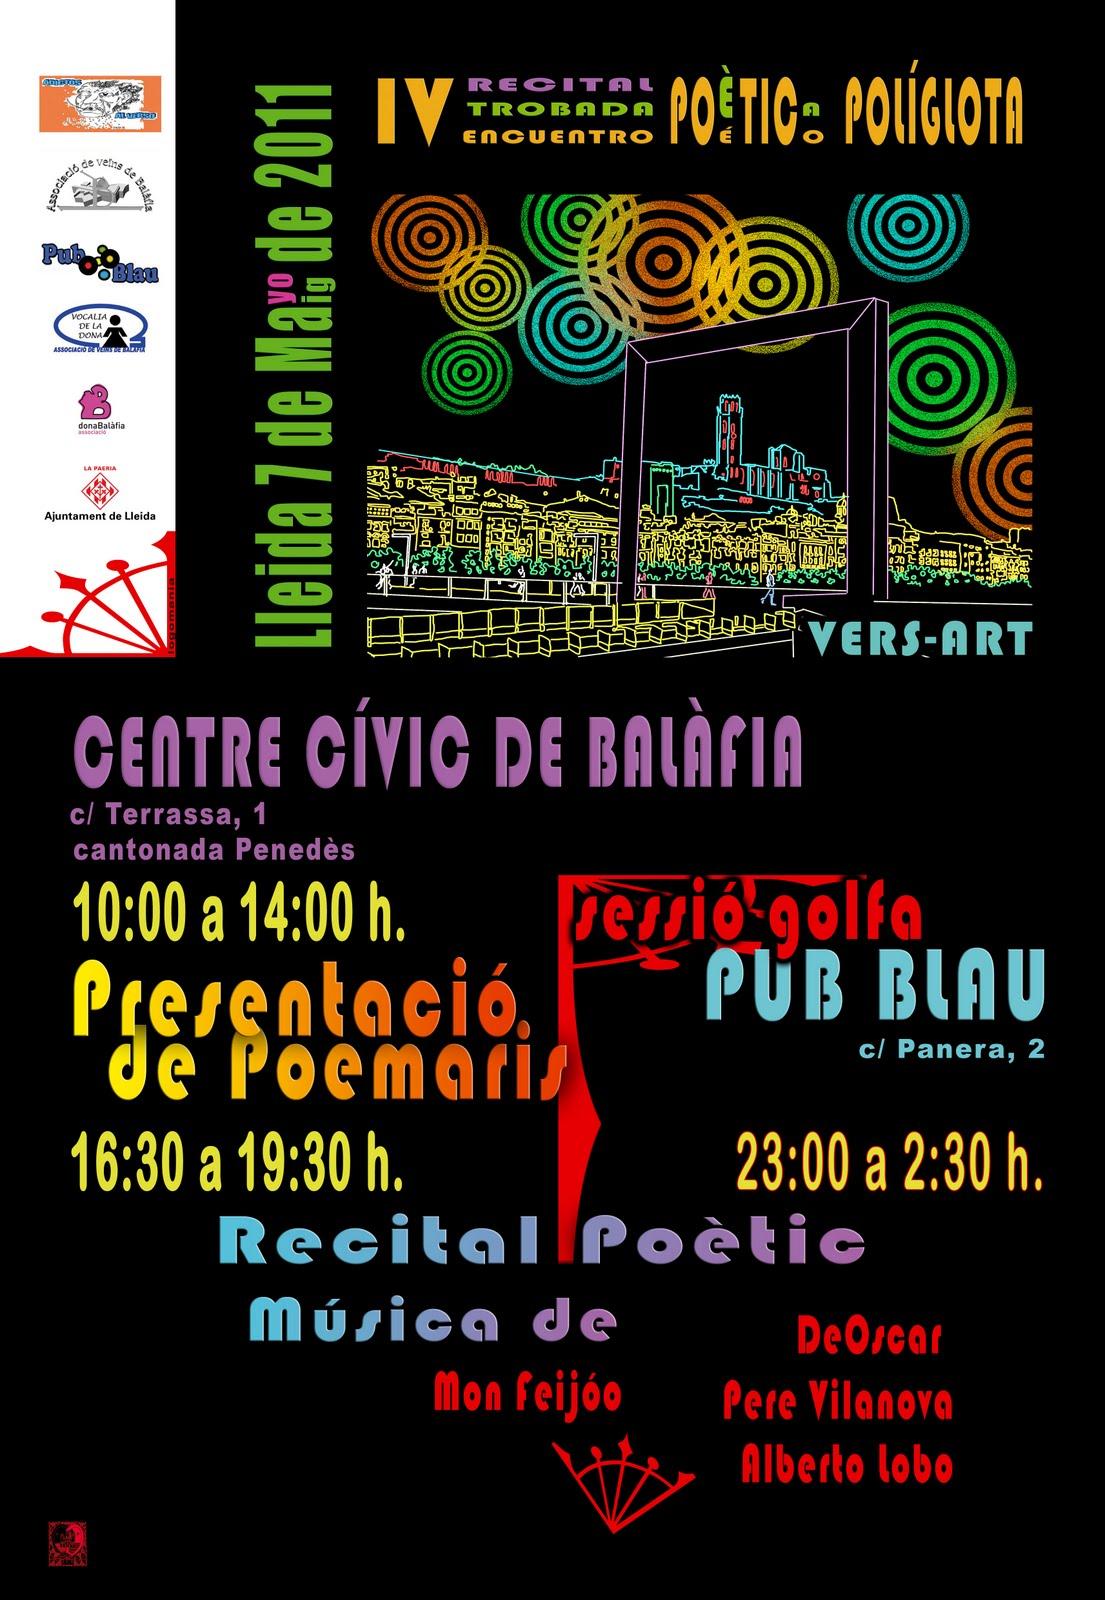 IV Recital poètic políglota